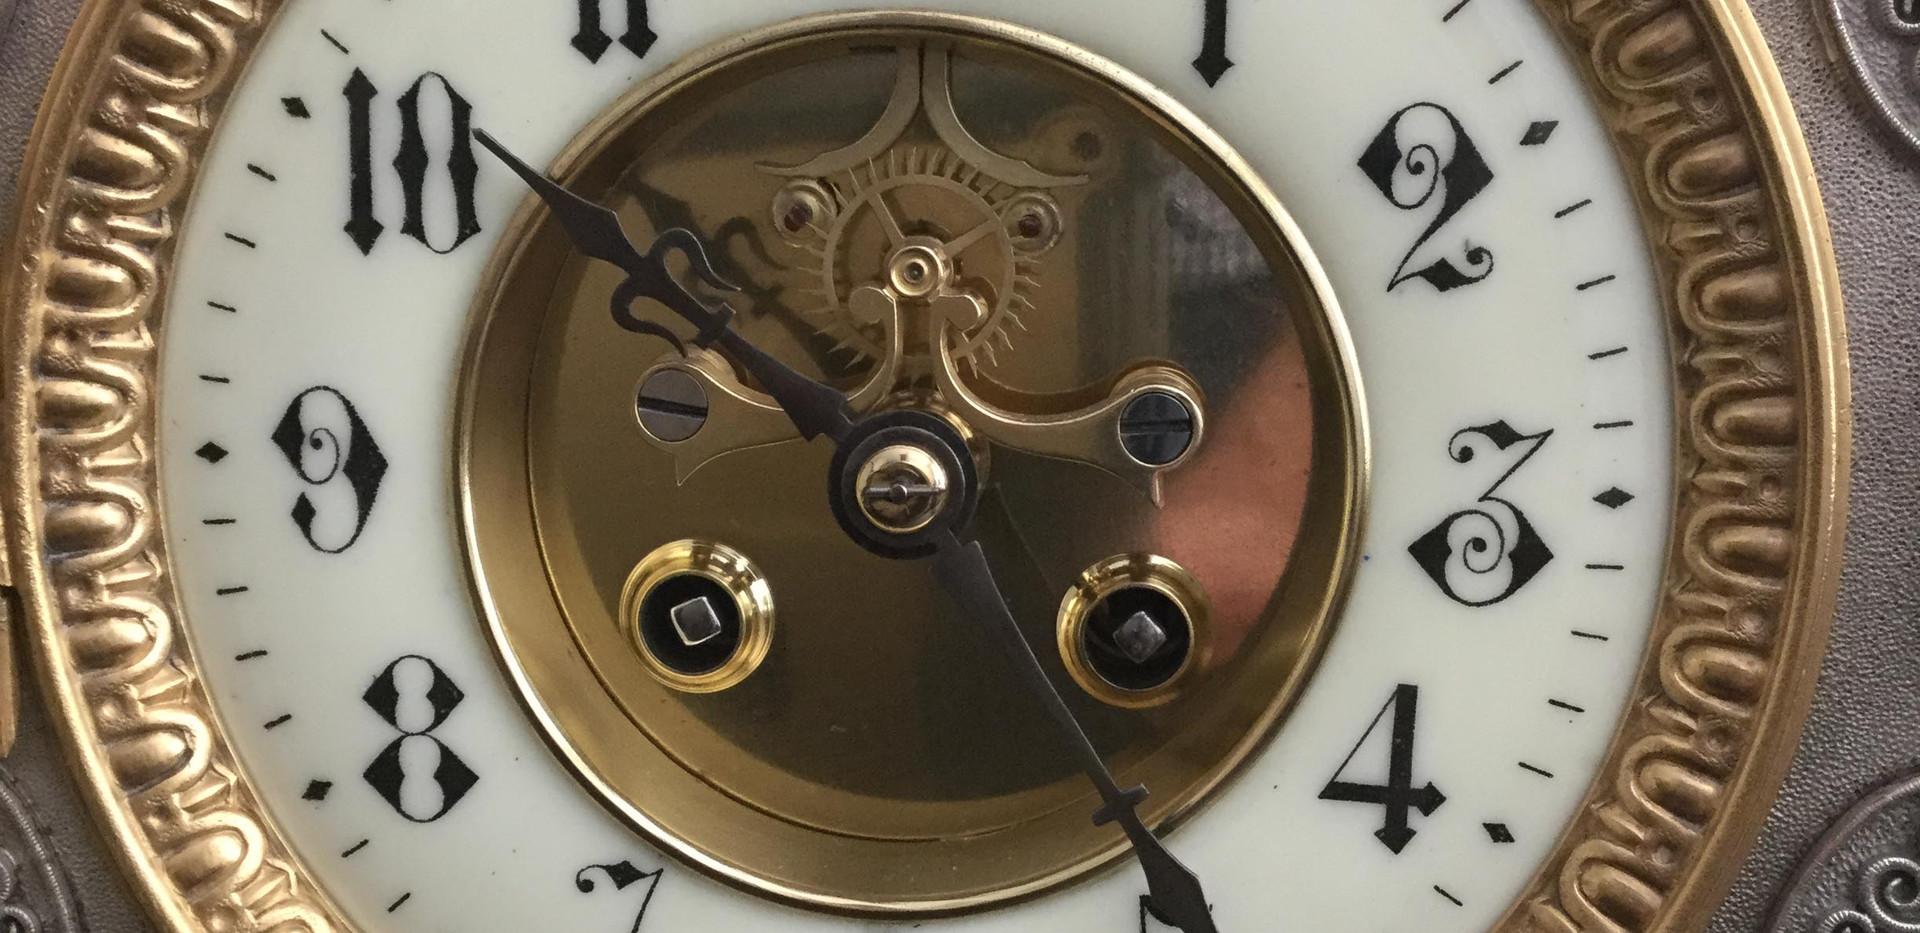 French Gothic Style Clockface